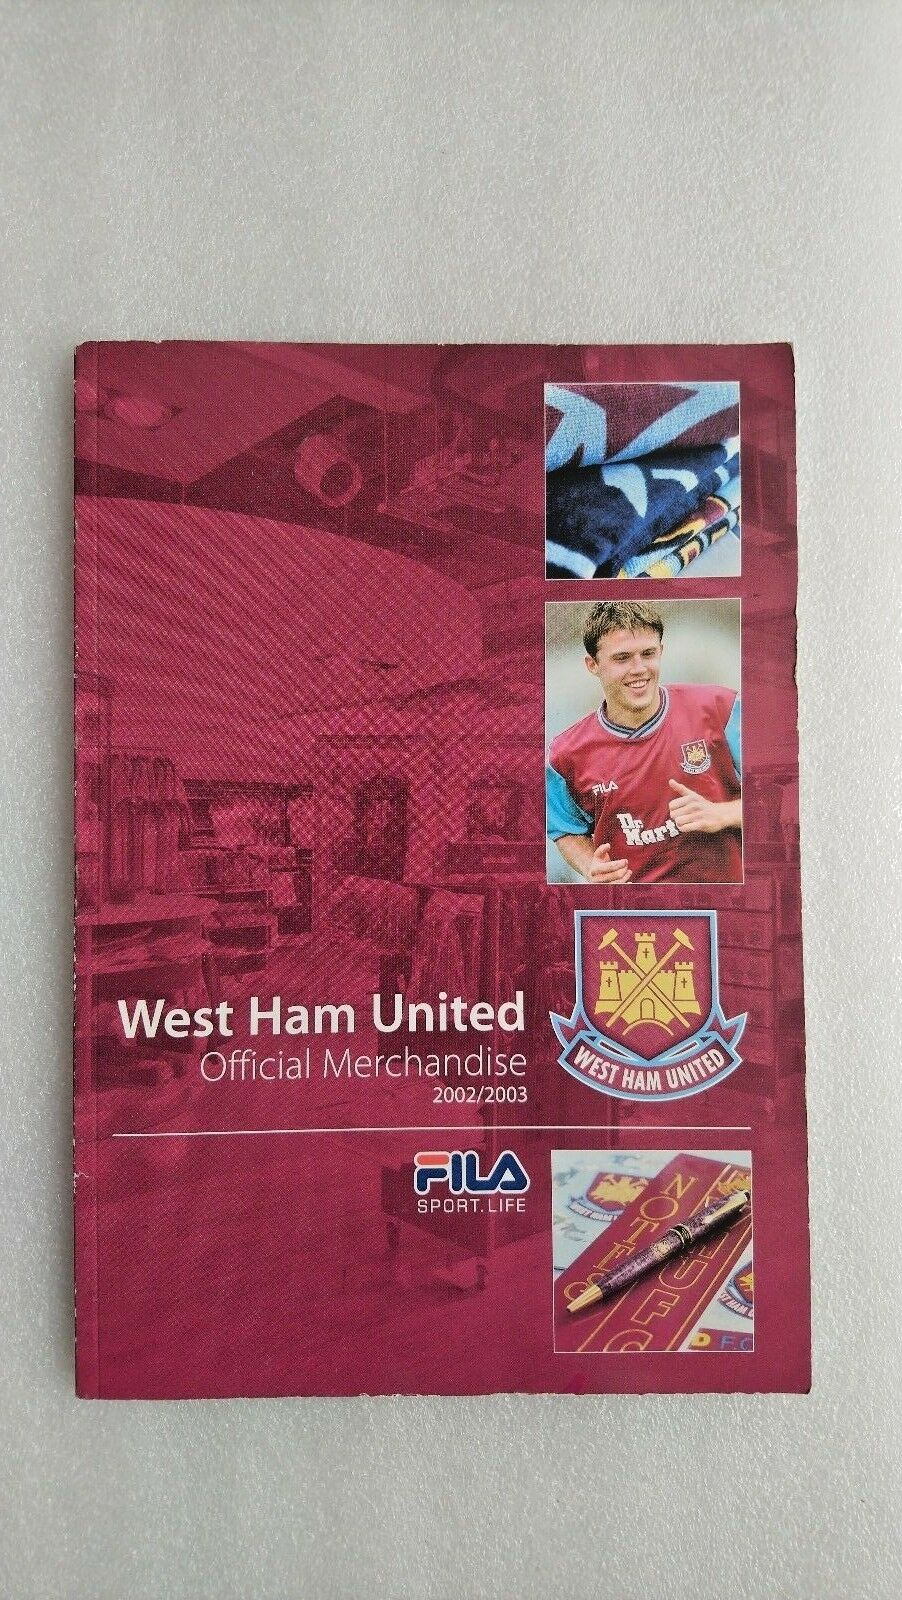 WEST HAM UNITED ( Official Merchandise Magazine 2002/3